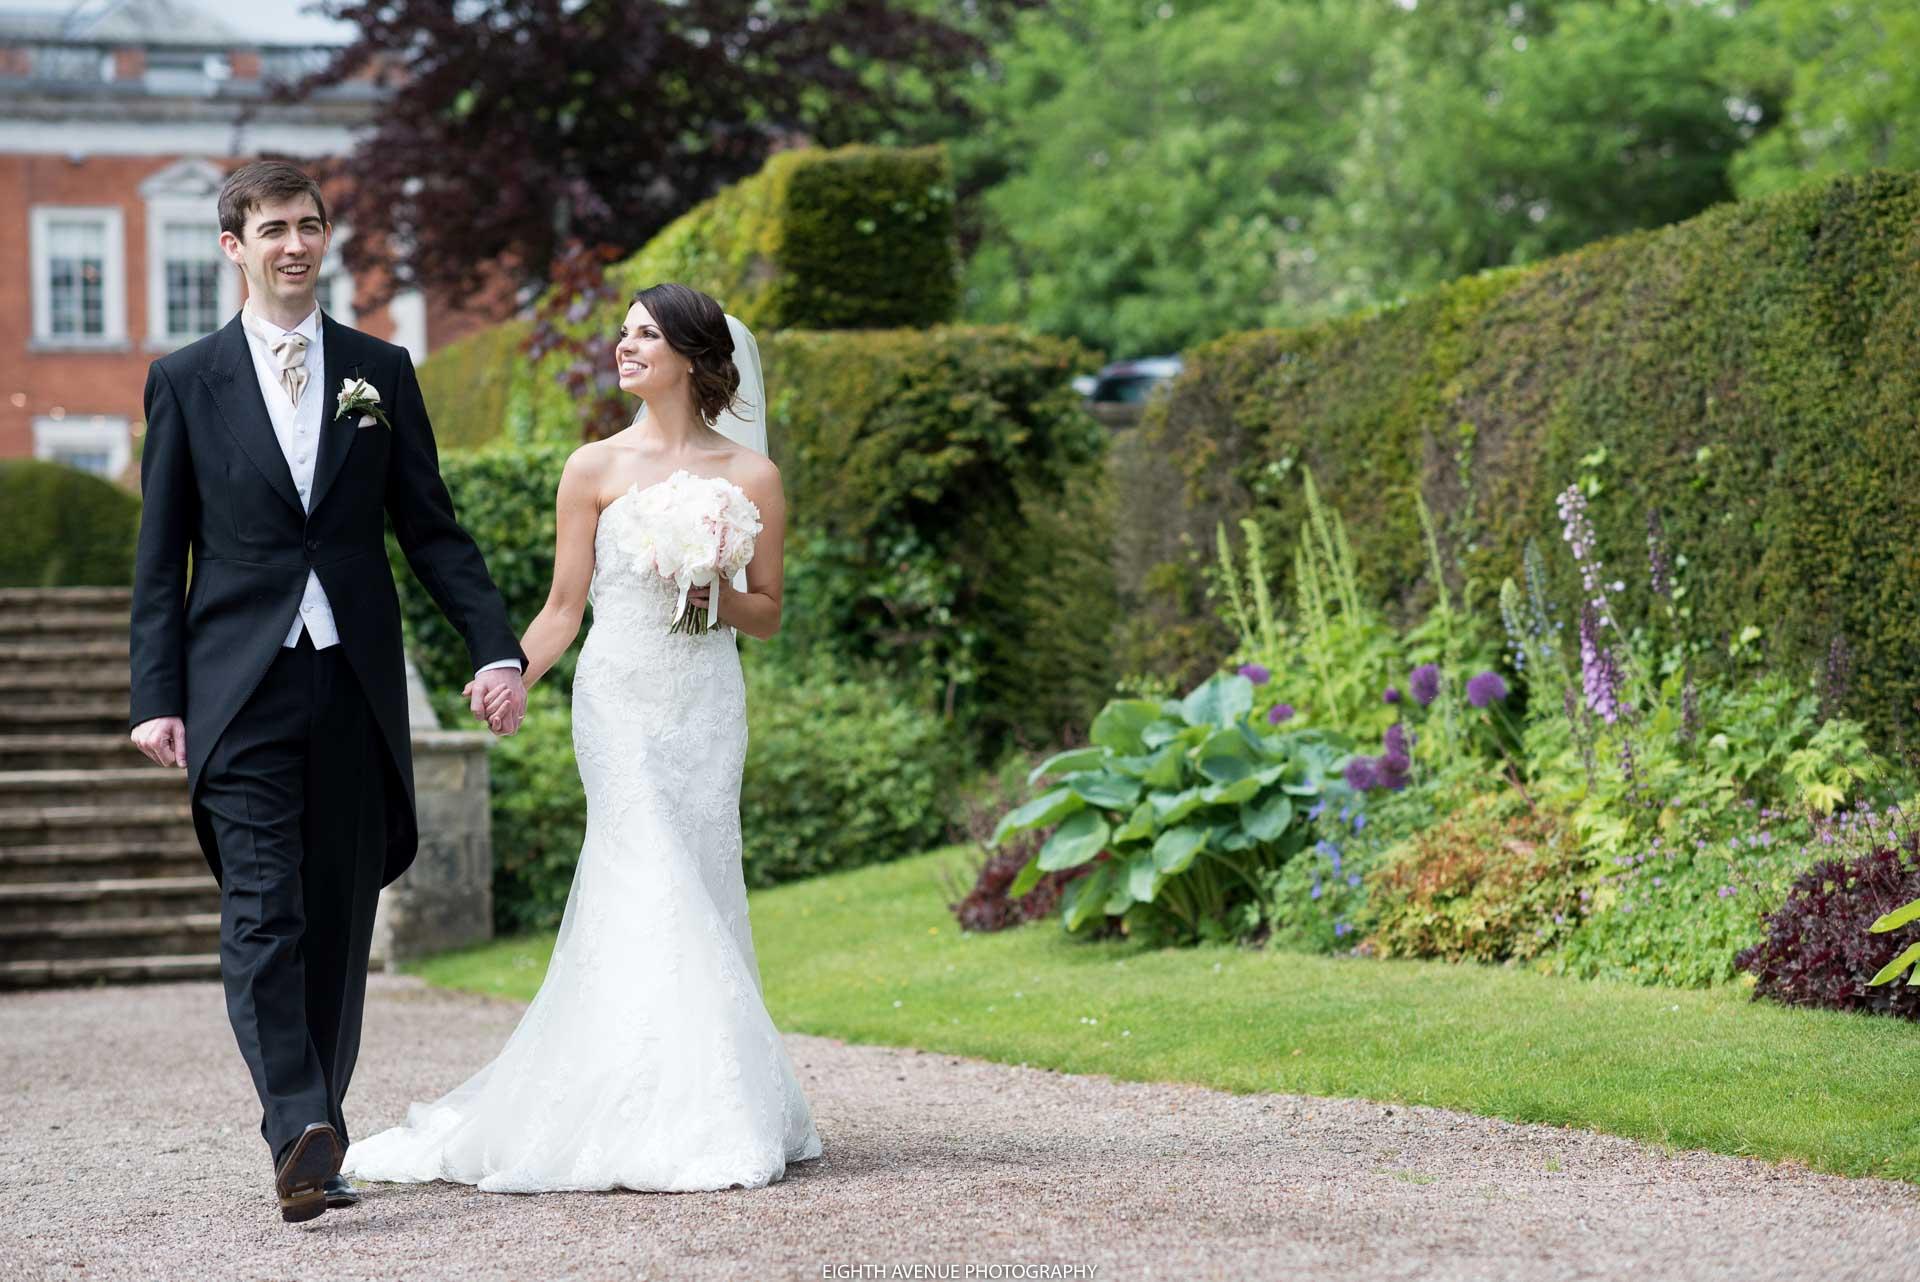 Bride and groom walking at Eaves Hall